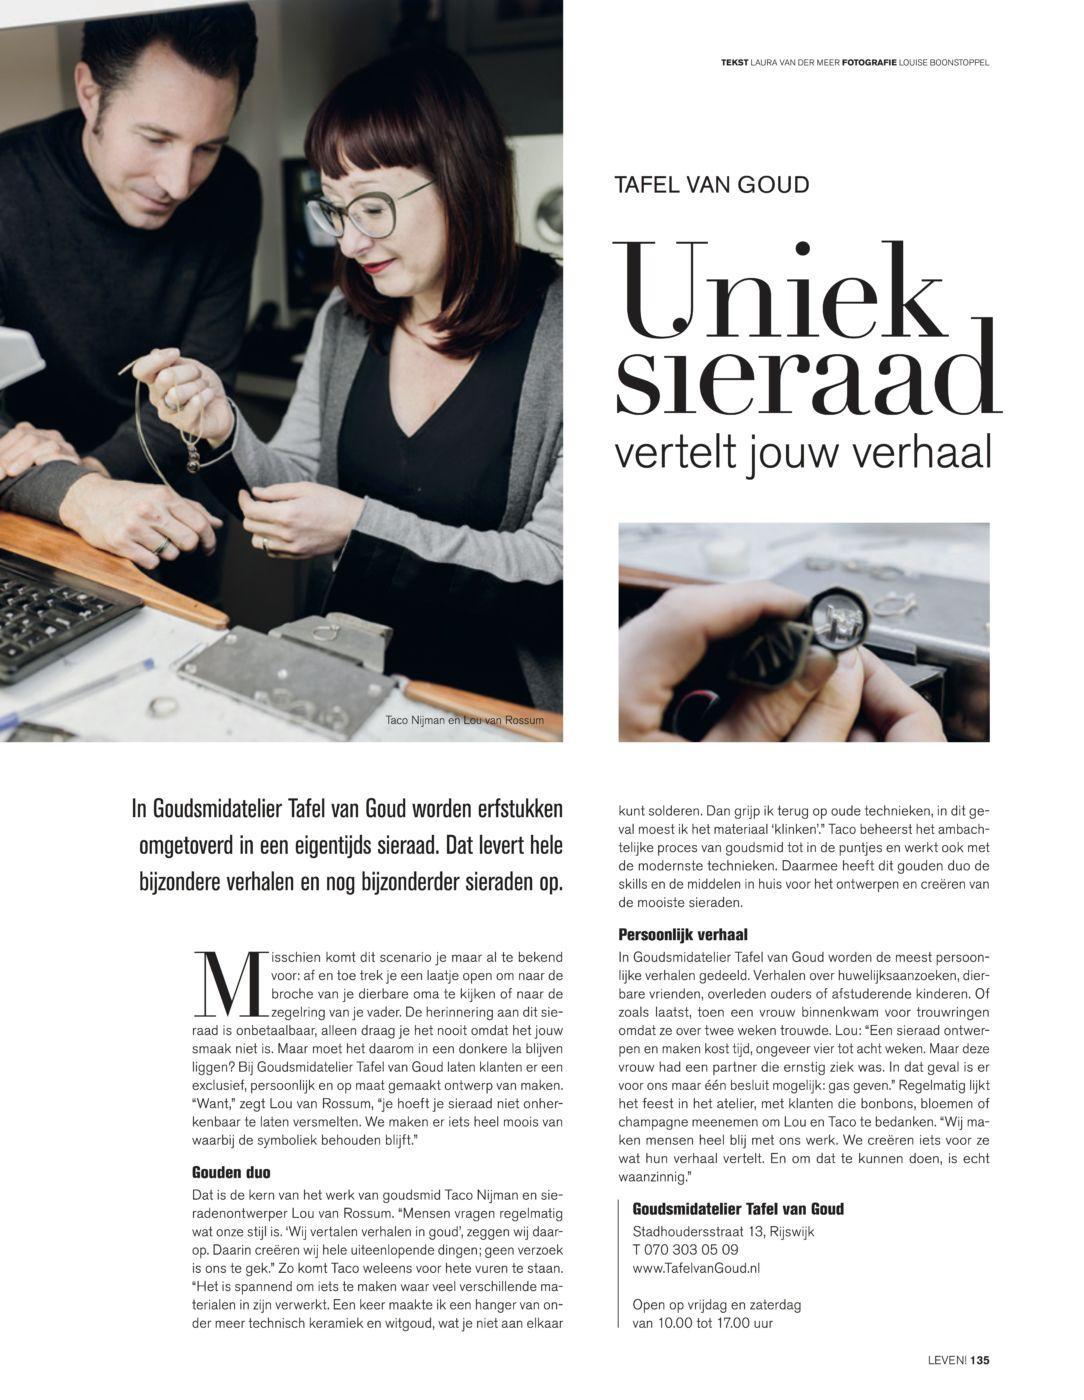 2018 Leven!Magazine Uniek Sieraad Tafel van Goud foto klein